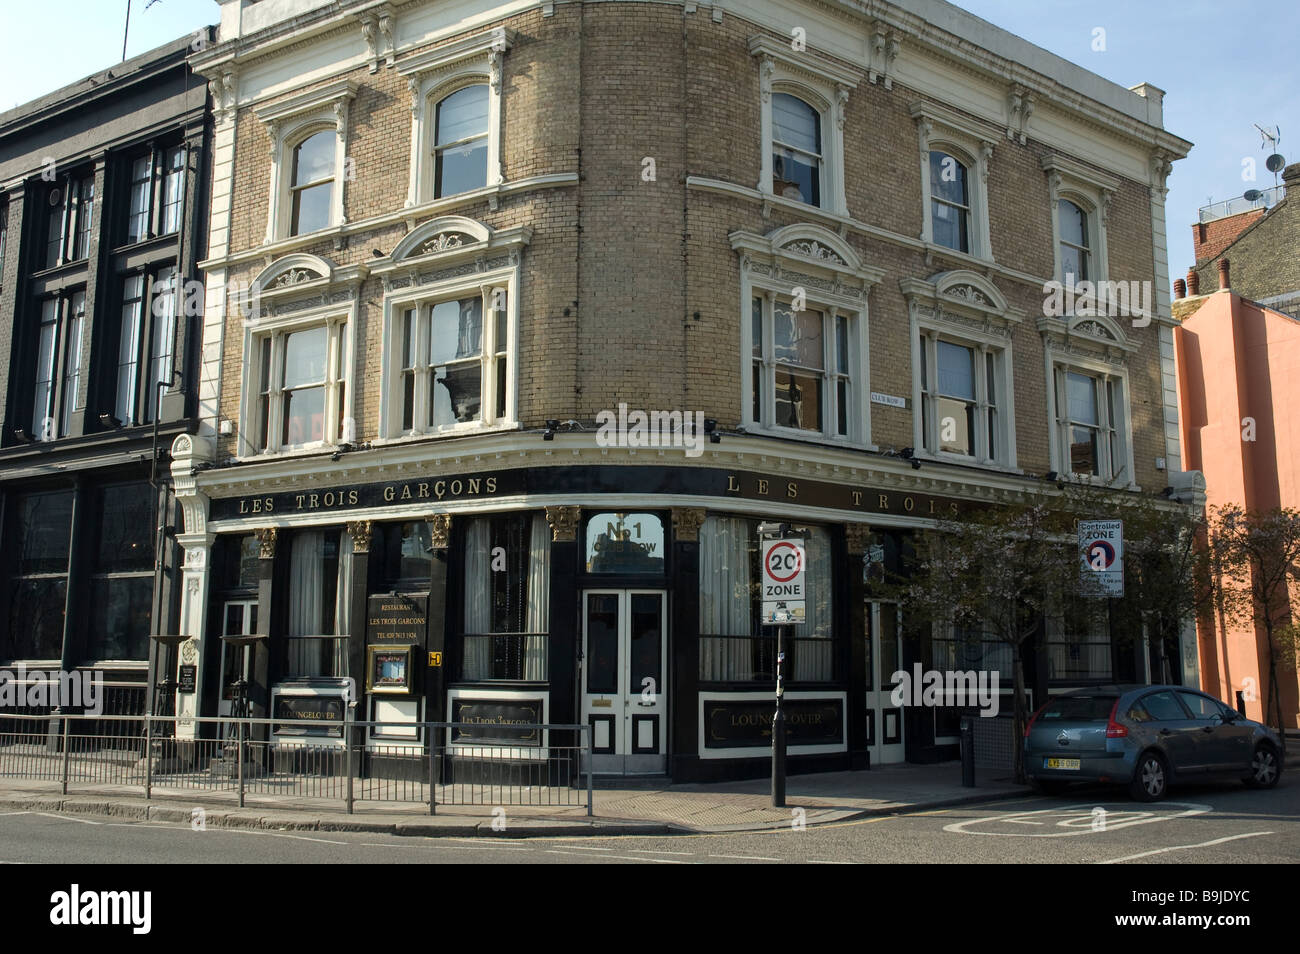 Les Trois Garcons,  Notable expensive gourmet retaurn=ant in East London UK - Stock Image